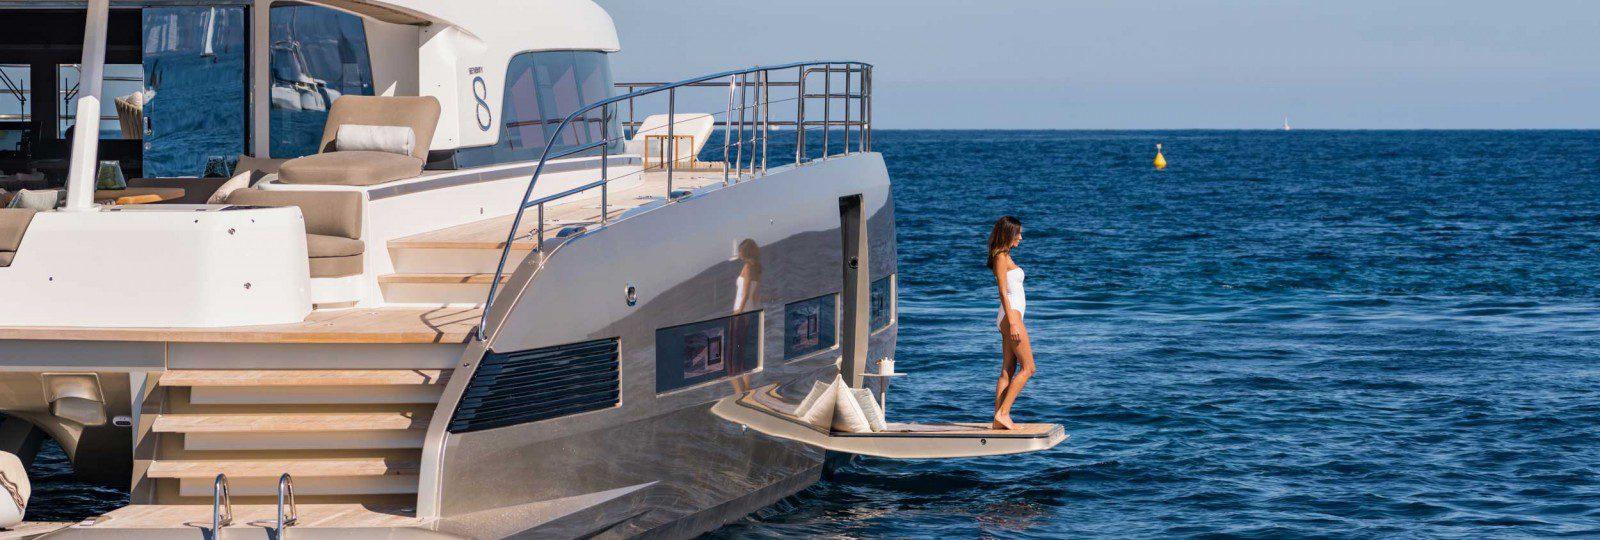 Lagoon Seventy8 master cabin bathing platform